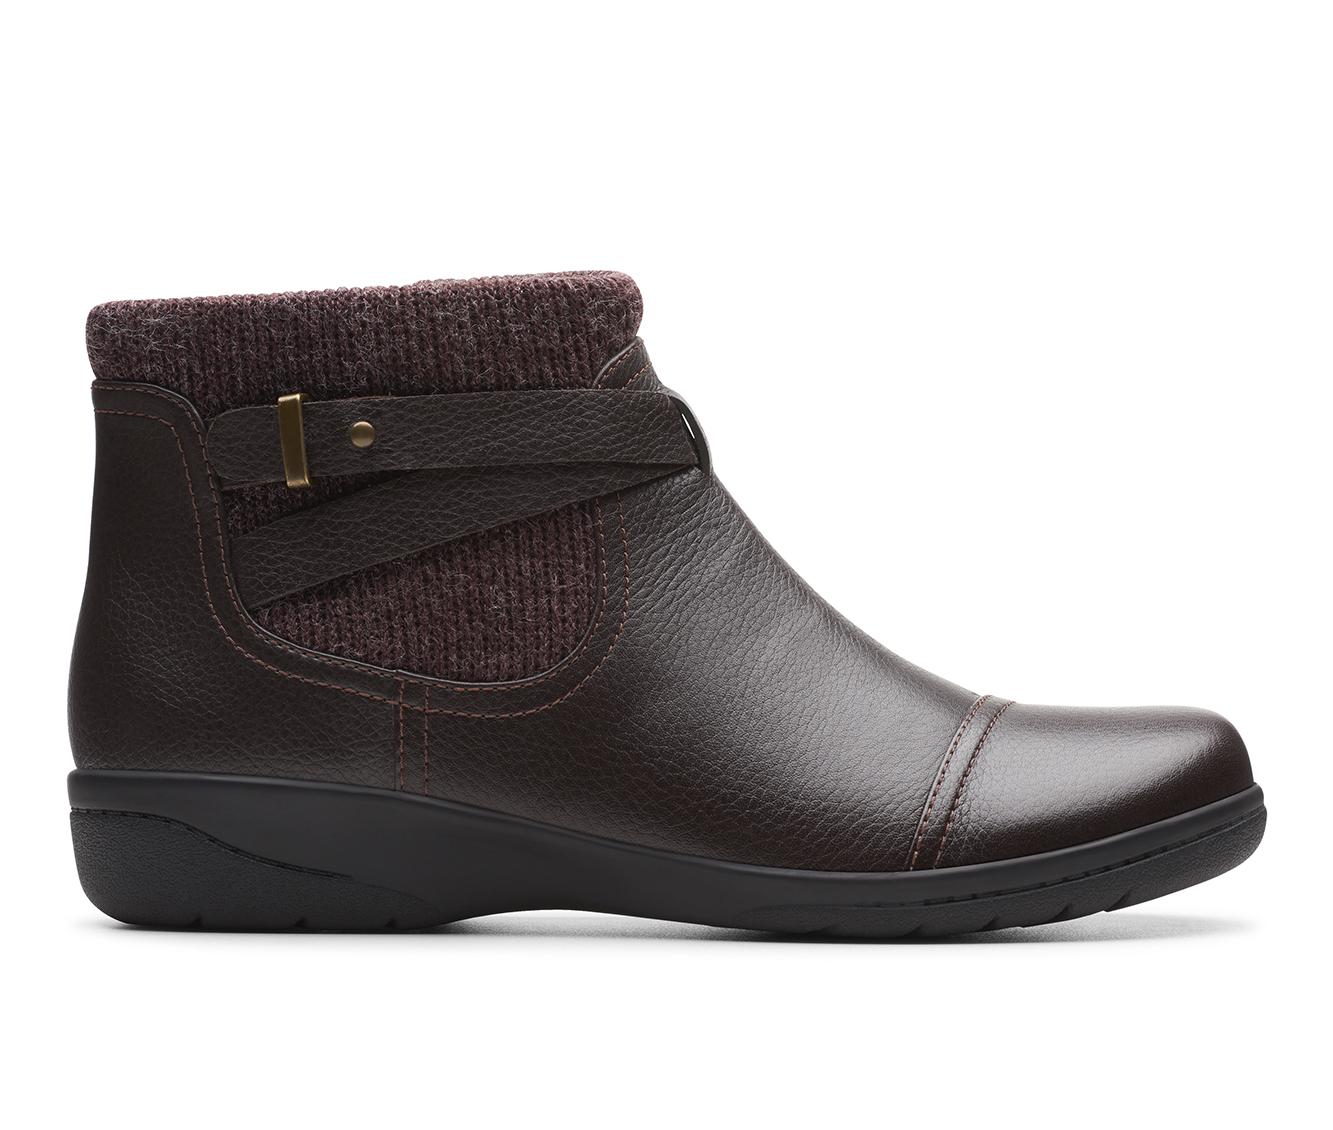 Clarks Cheyn Kisha Women's Boot (Brown Leather)